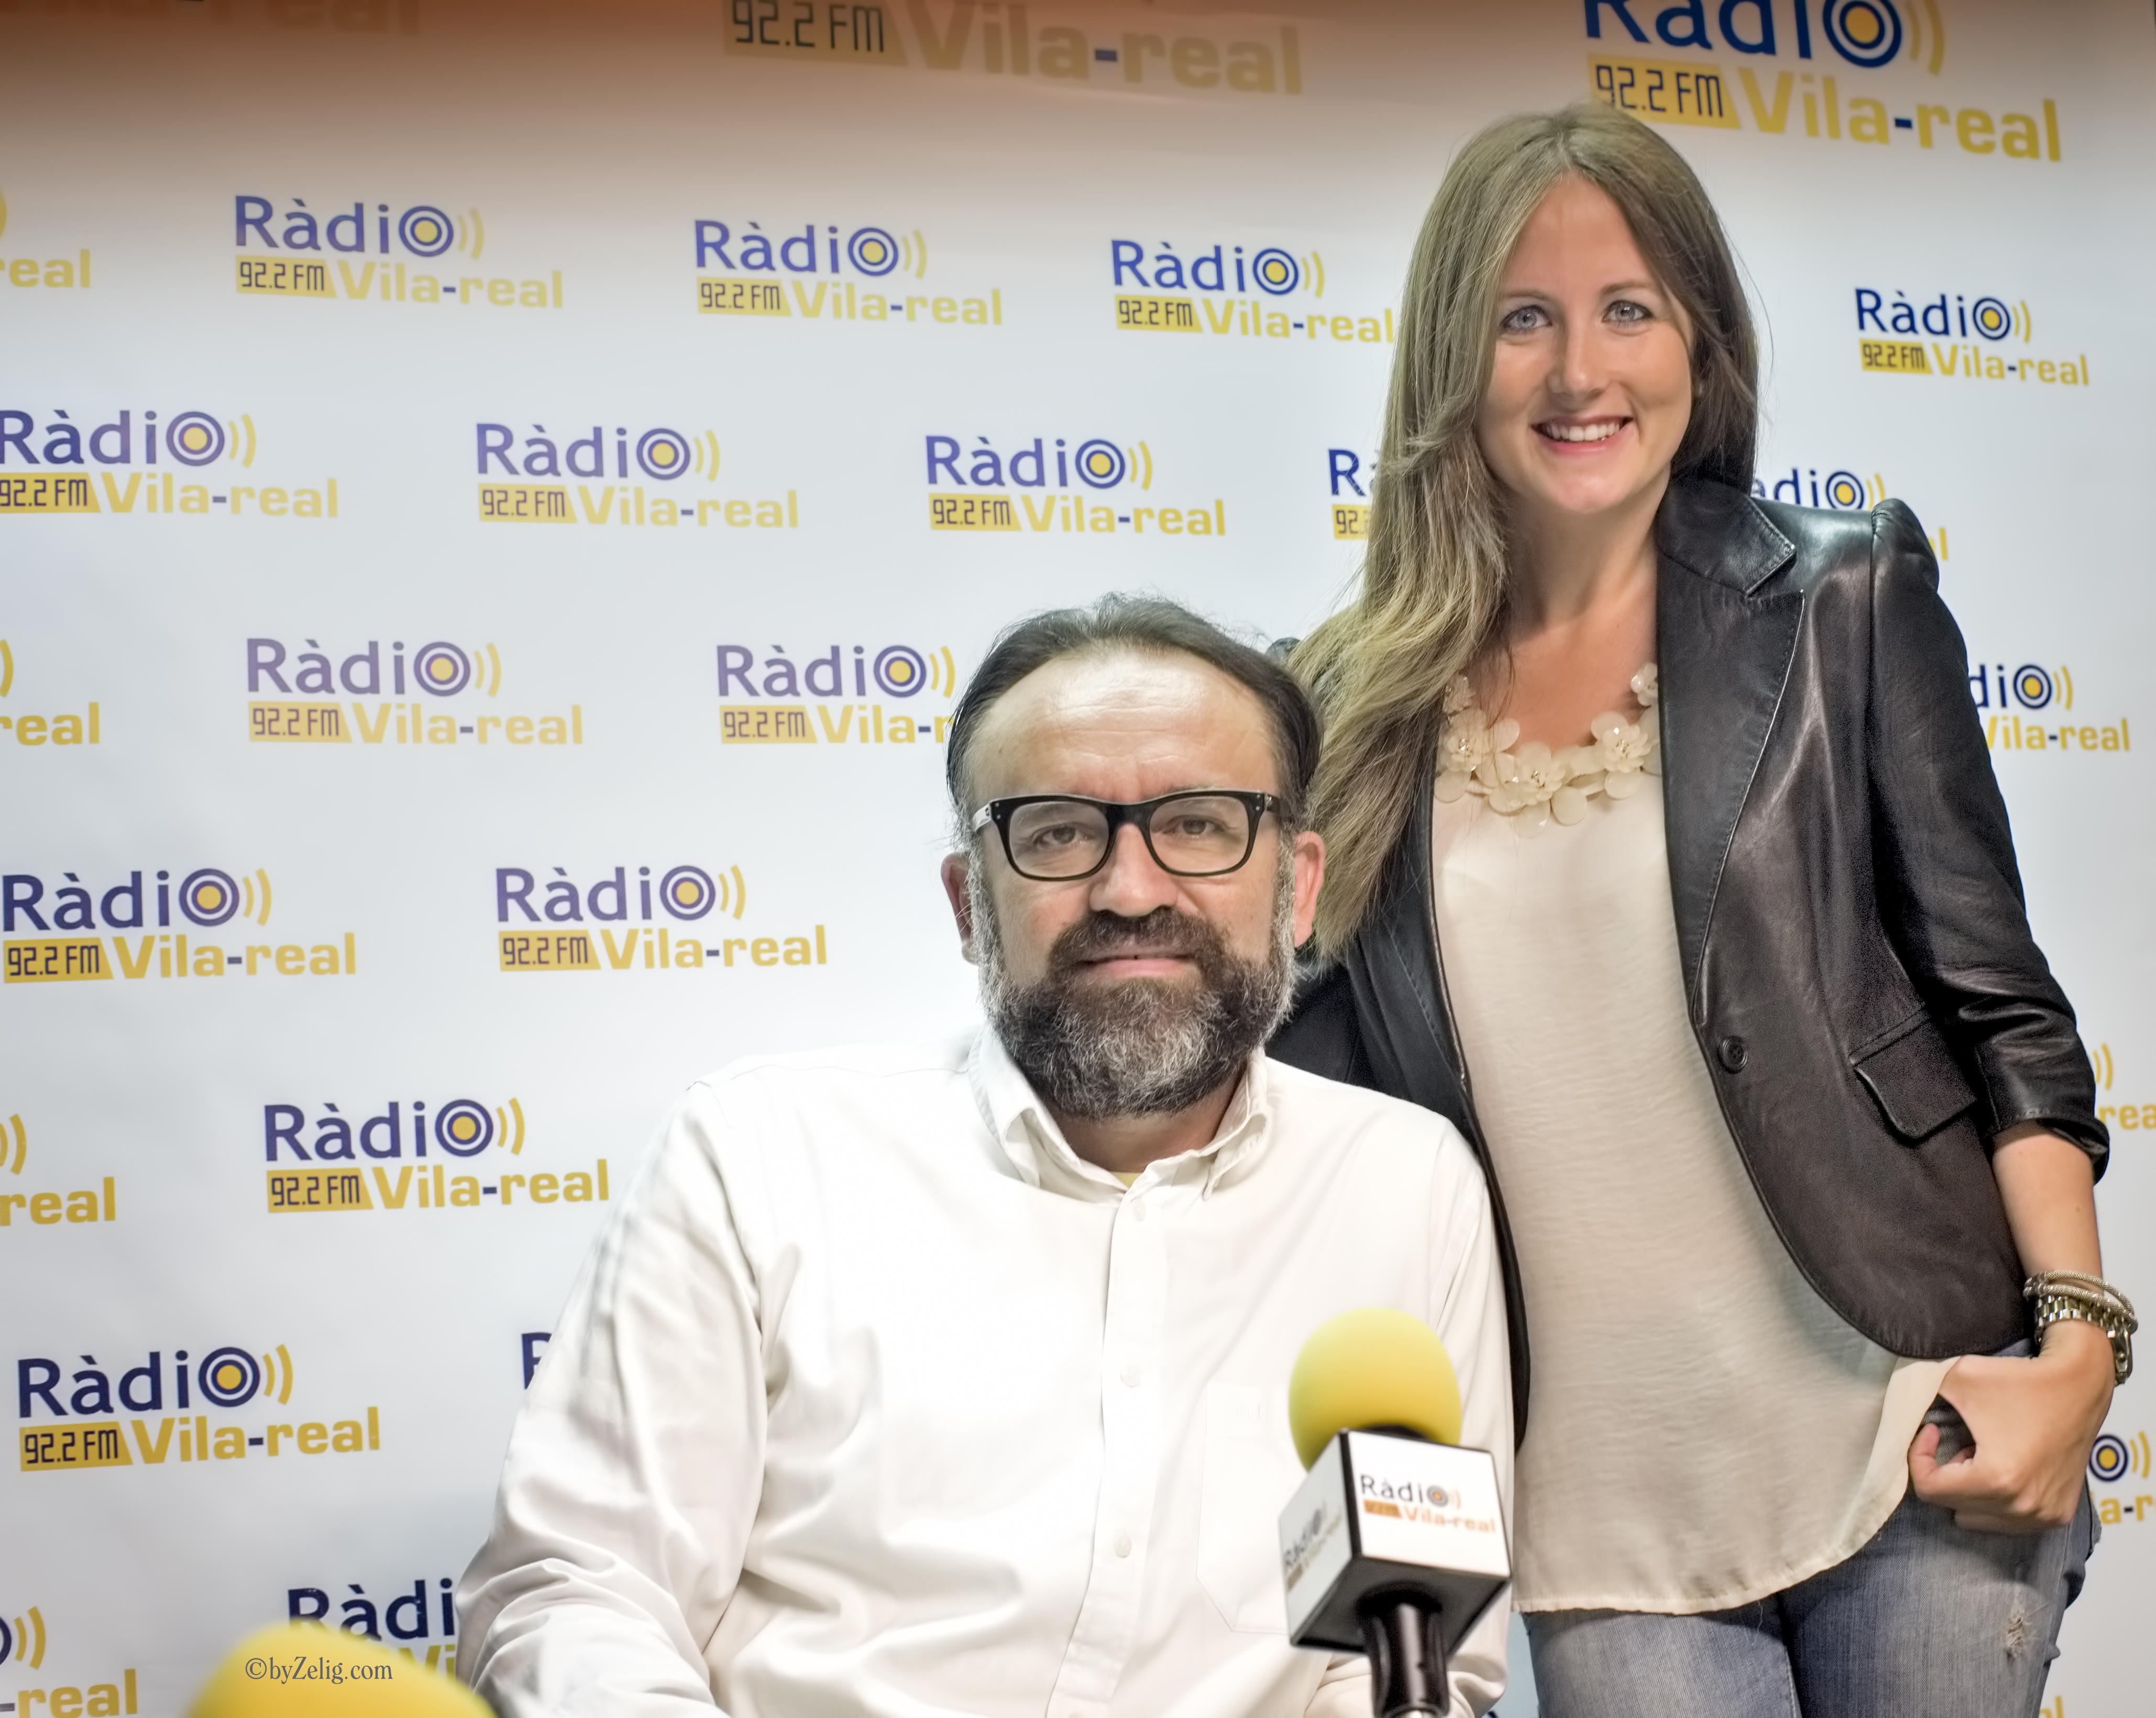 Esports Radio Vila-real. Programa del 14 de febrero 2018